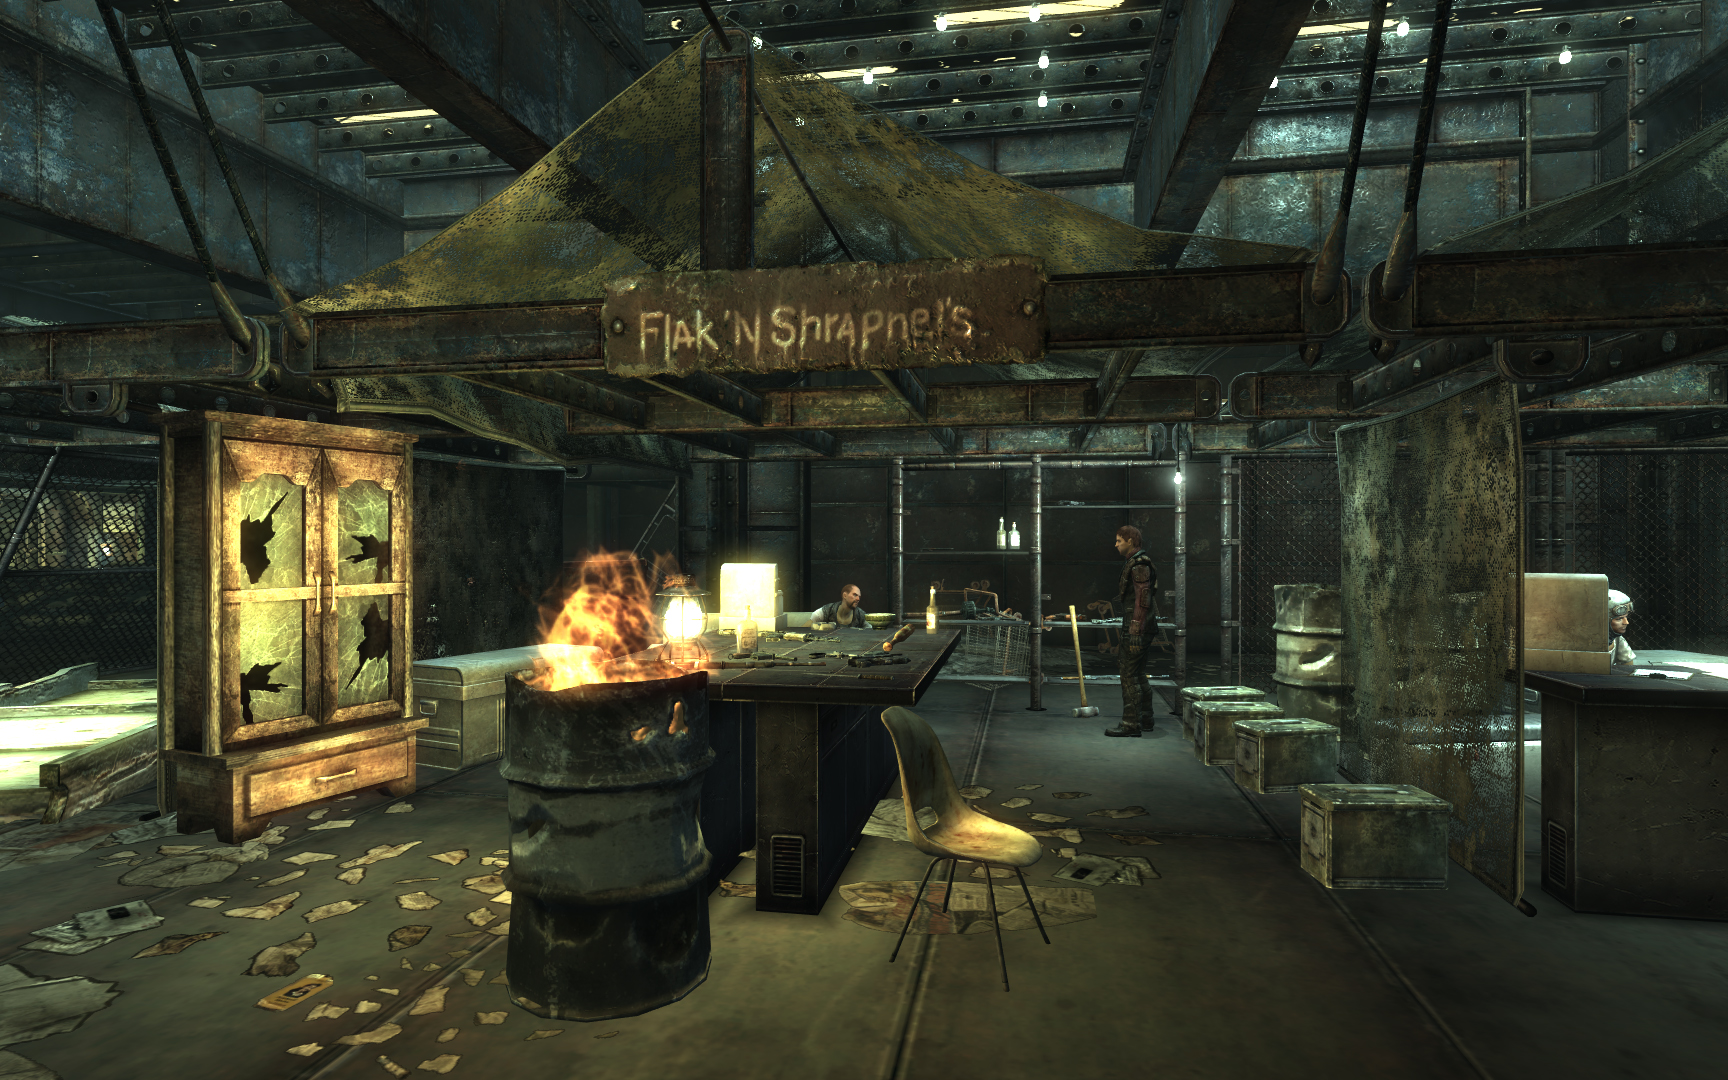 Flak 39 n shrapnel 39 s the fallout wiki fallout new vegas for Entrance to rivet city